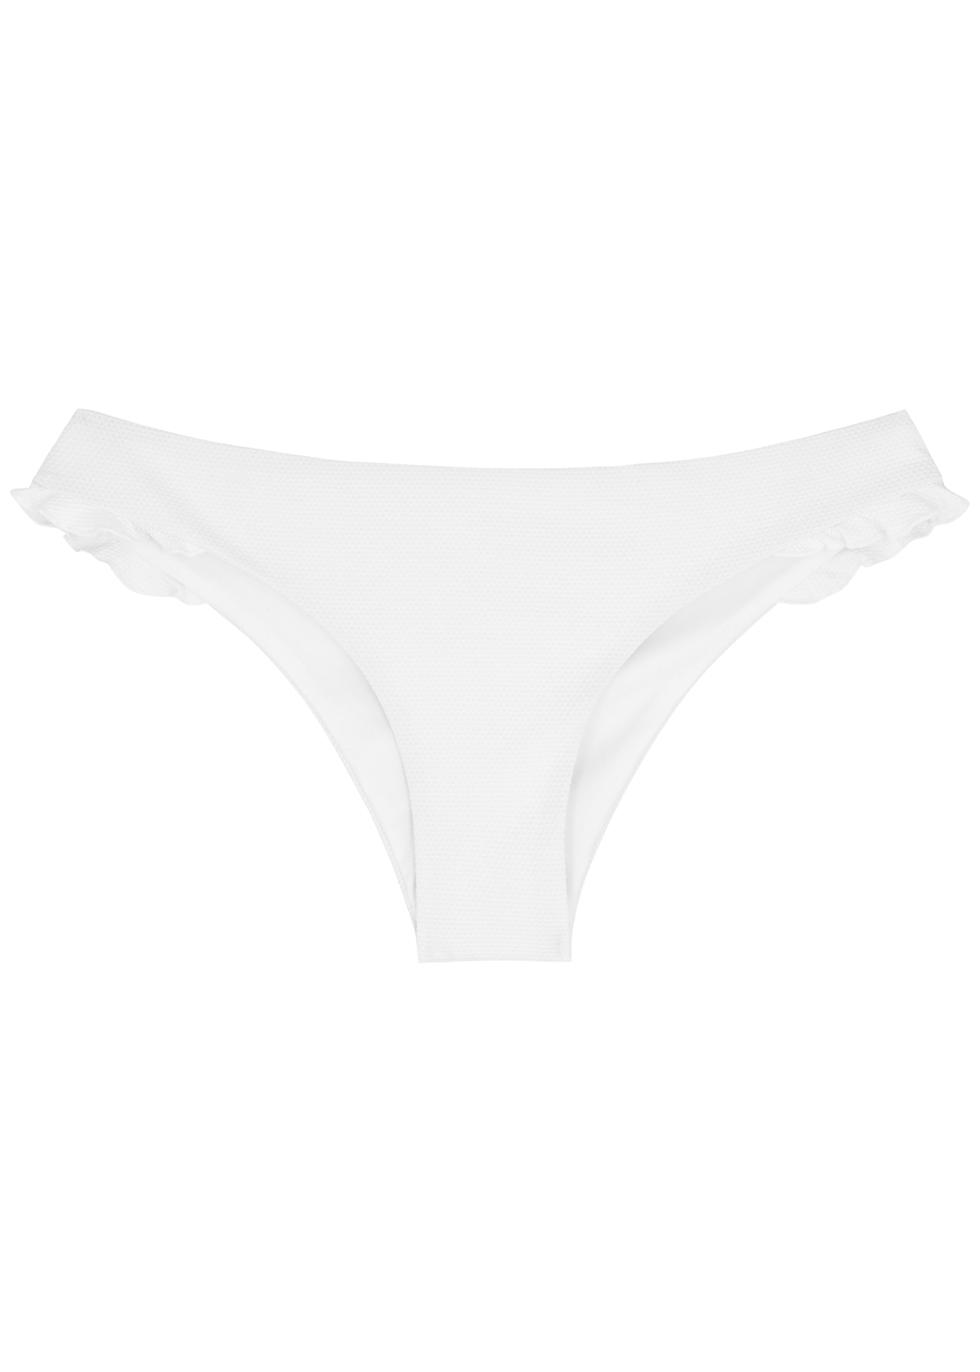 Olivia white ruffle-trimmed bikini briefs